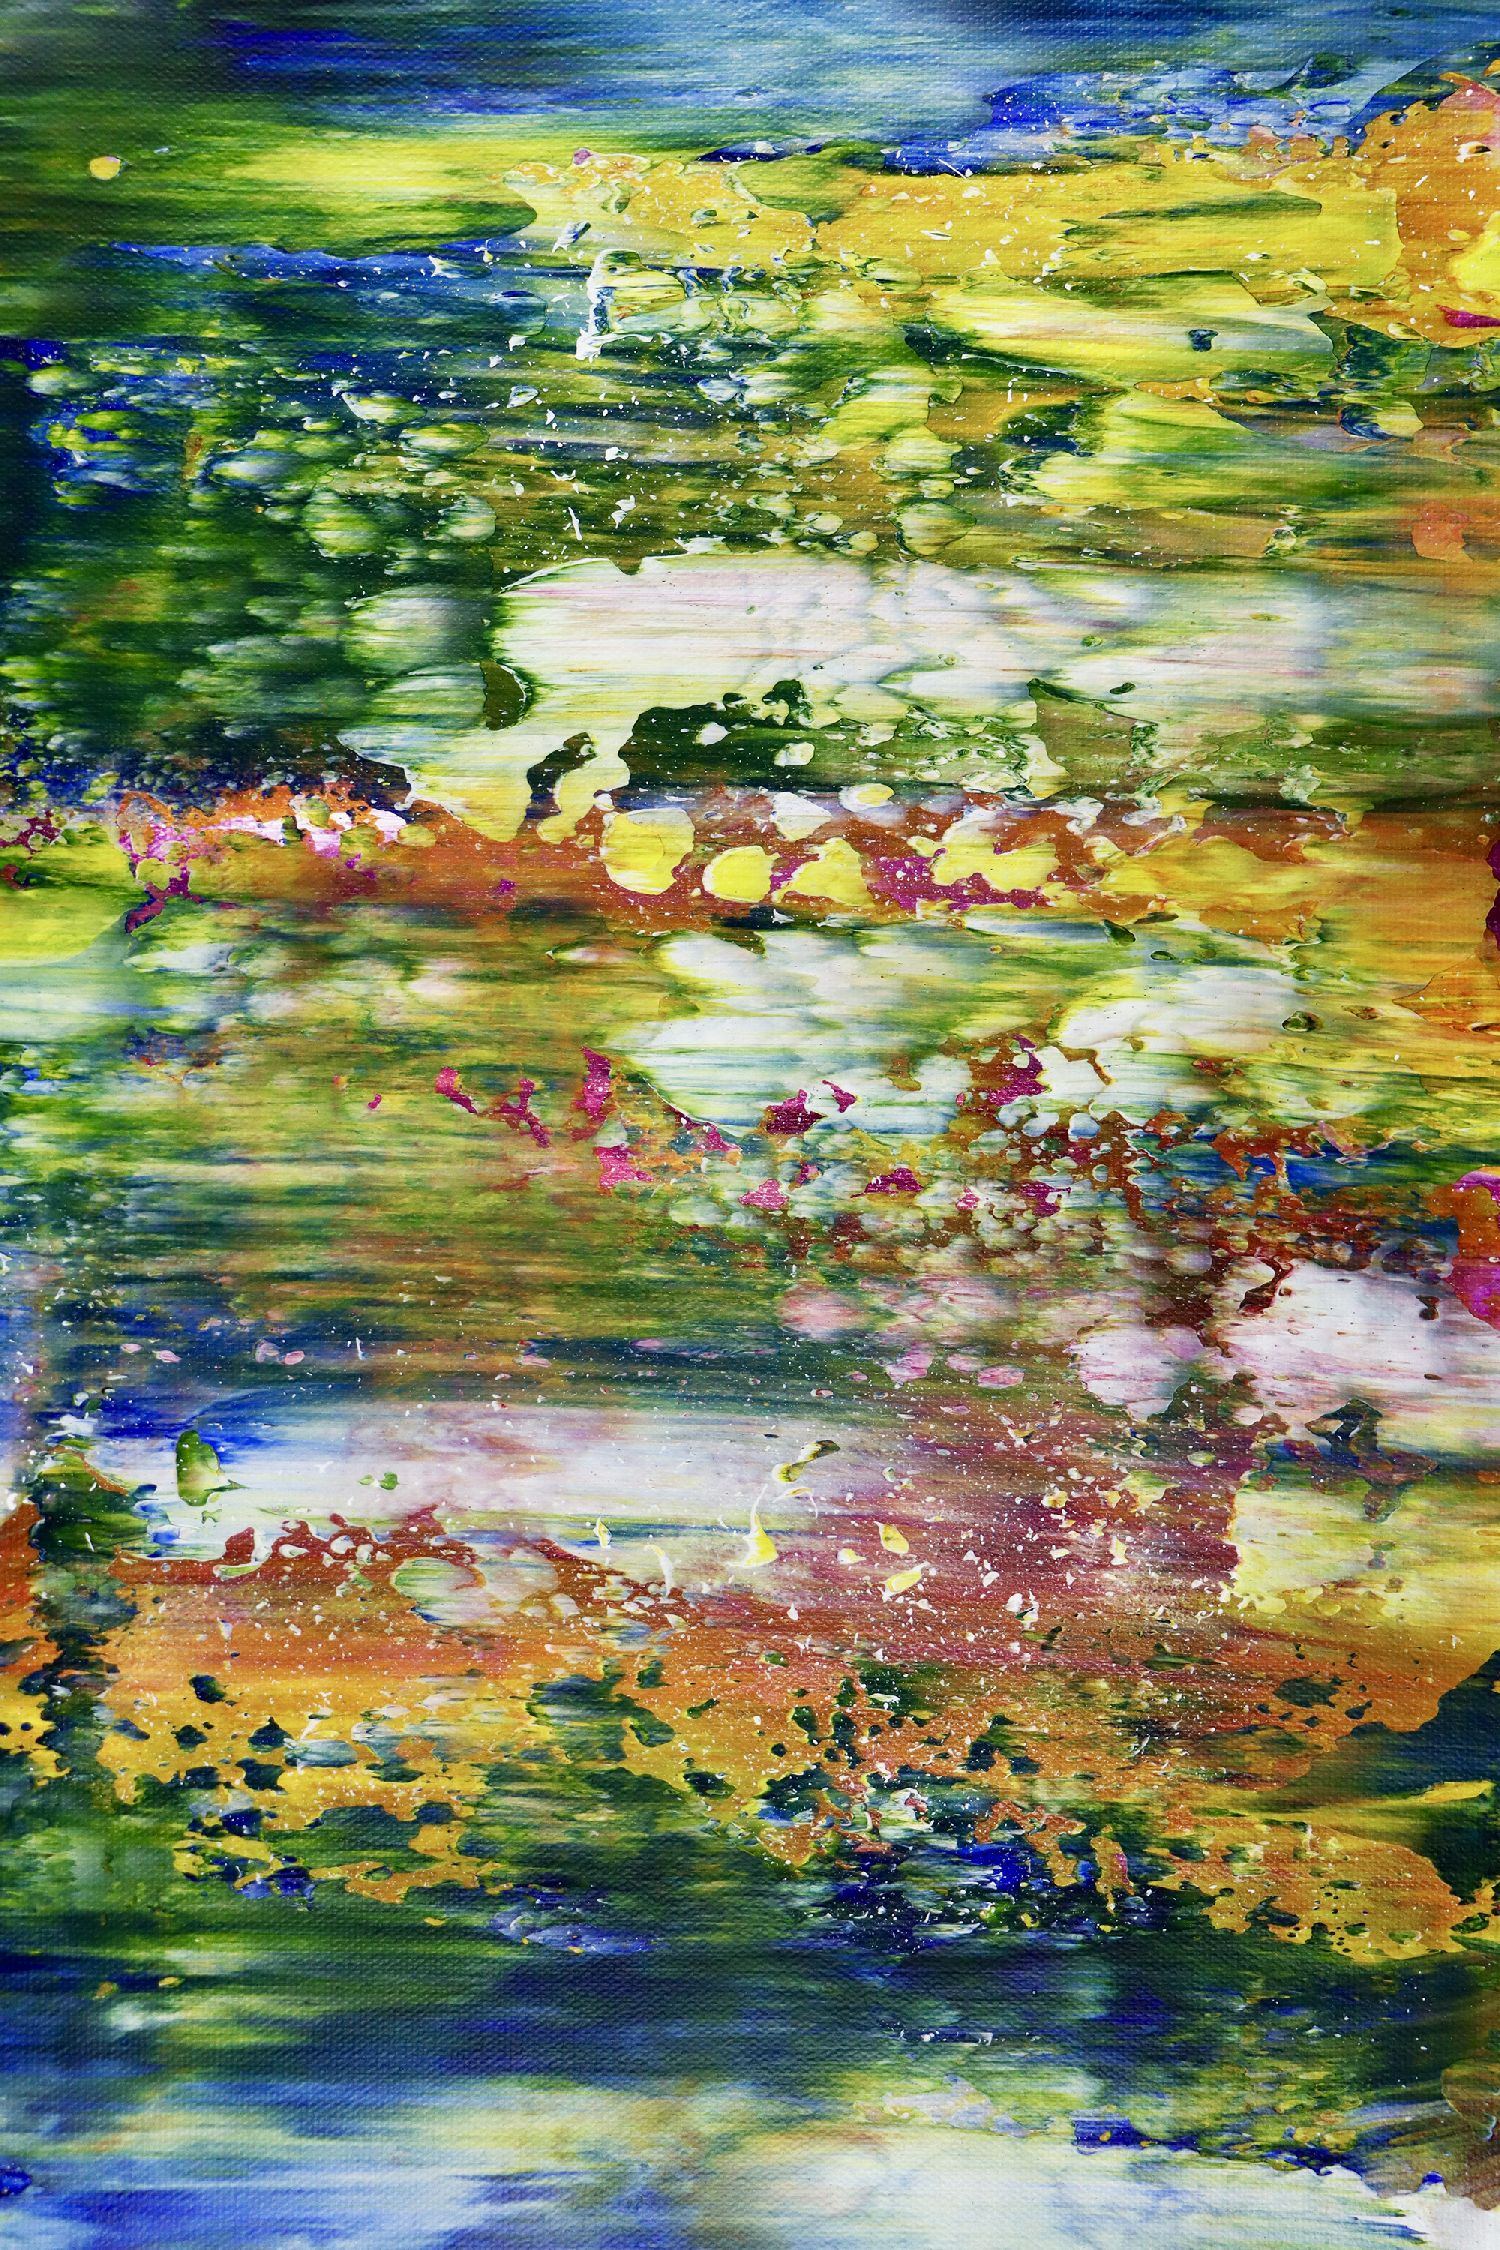 Detail - Rio Azul Infinito (Infinite Blue River) (2020)